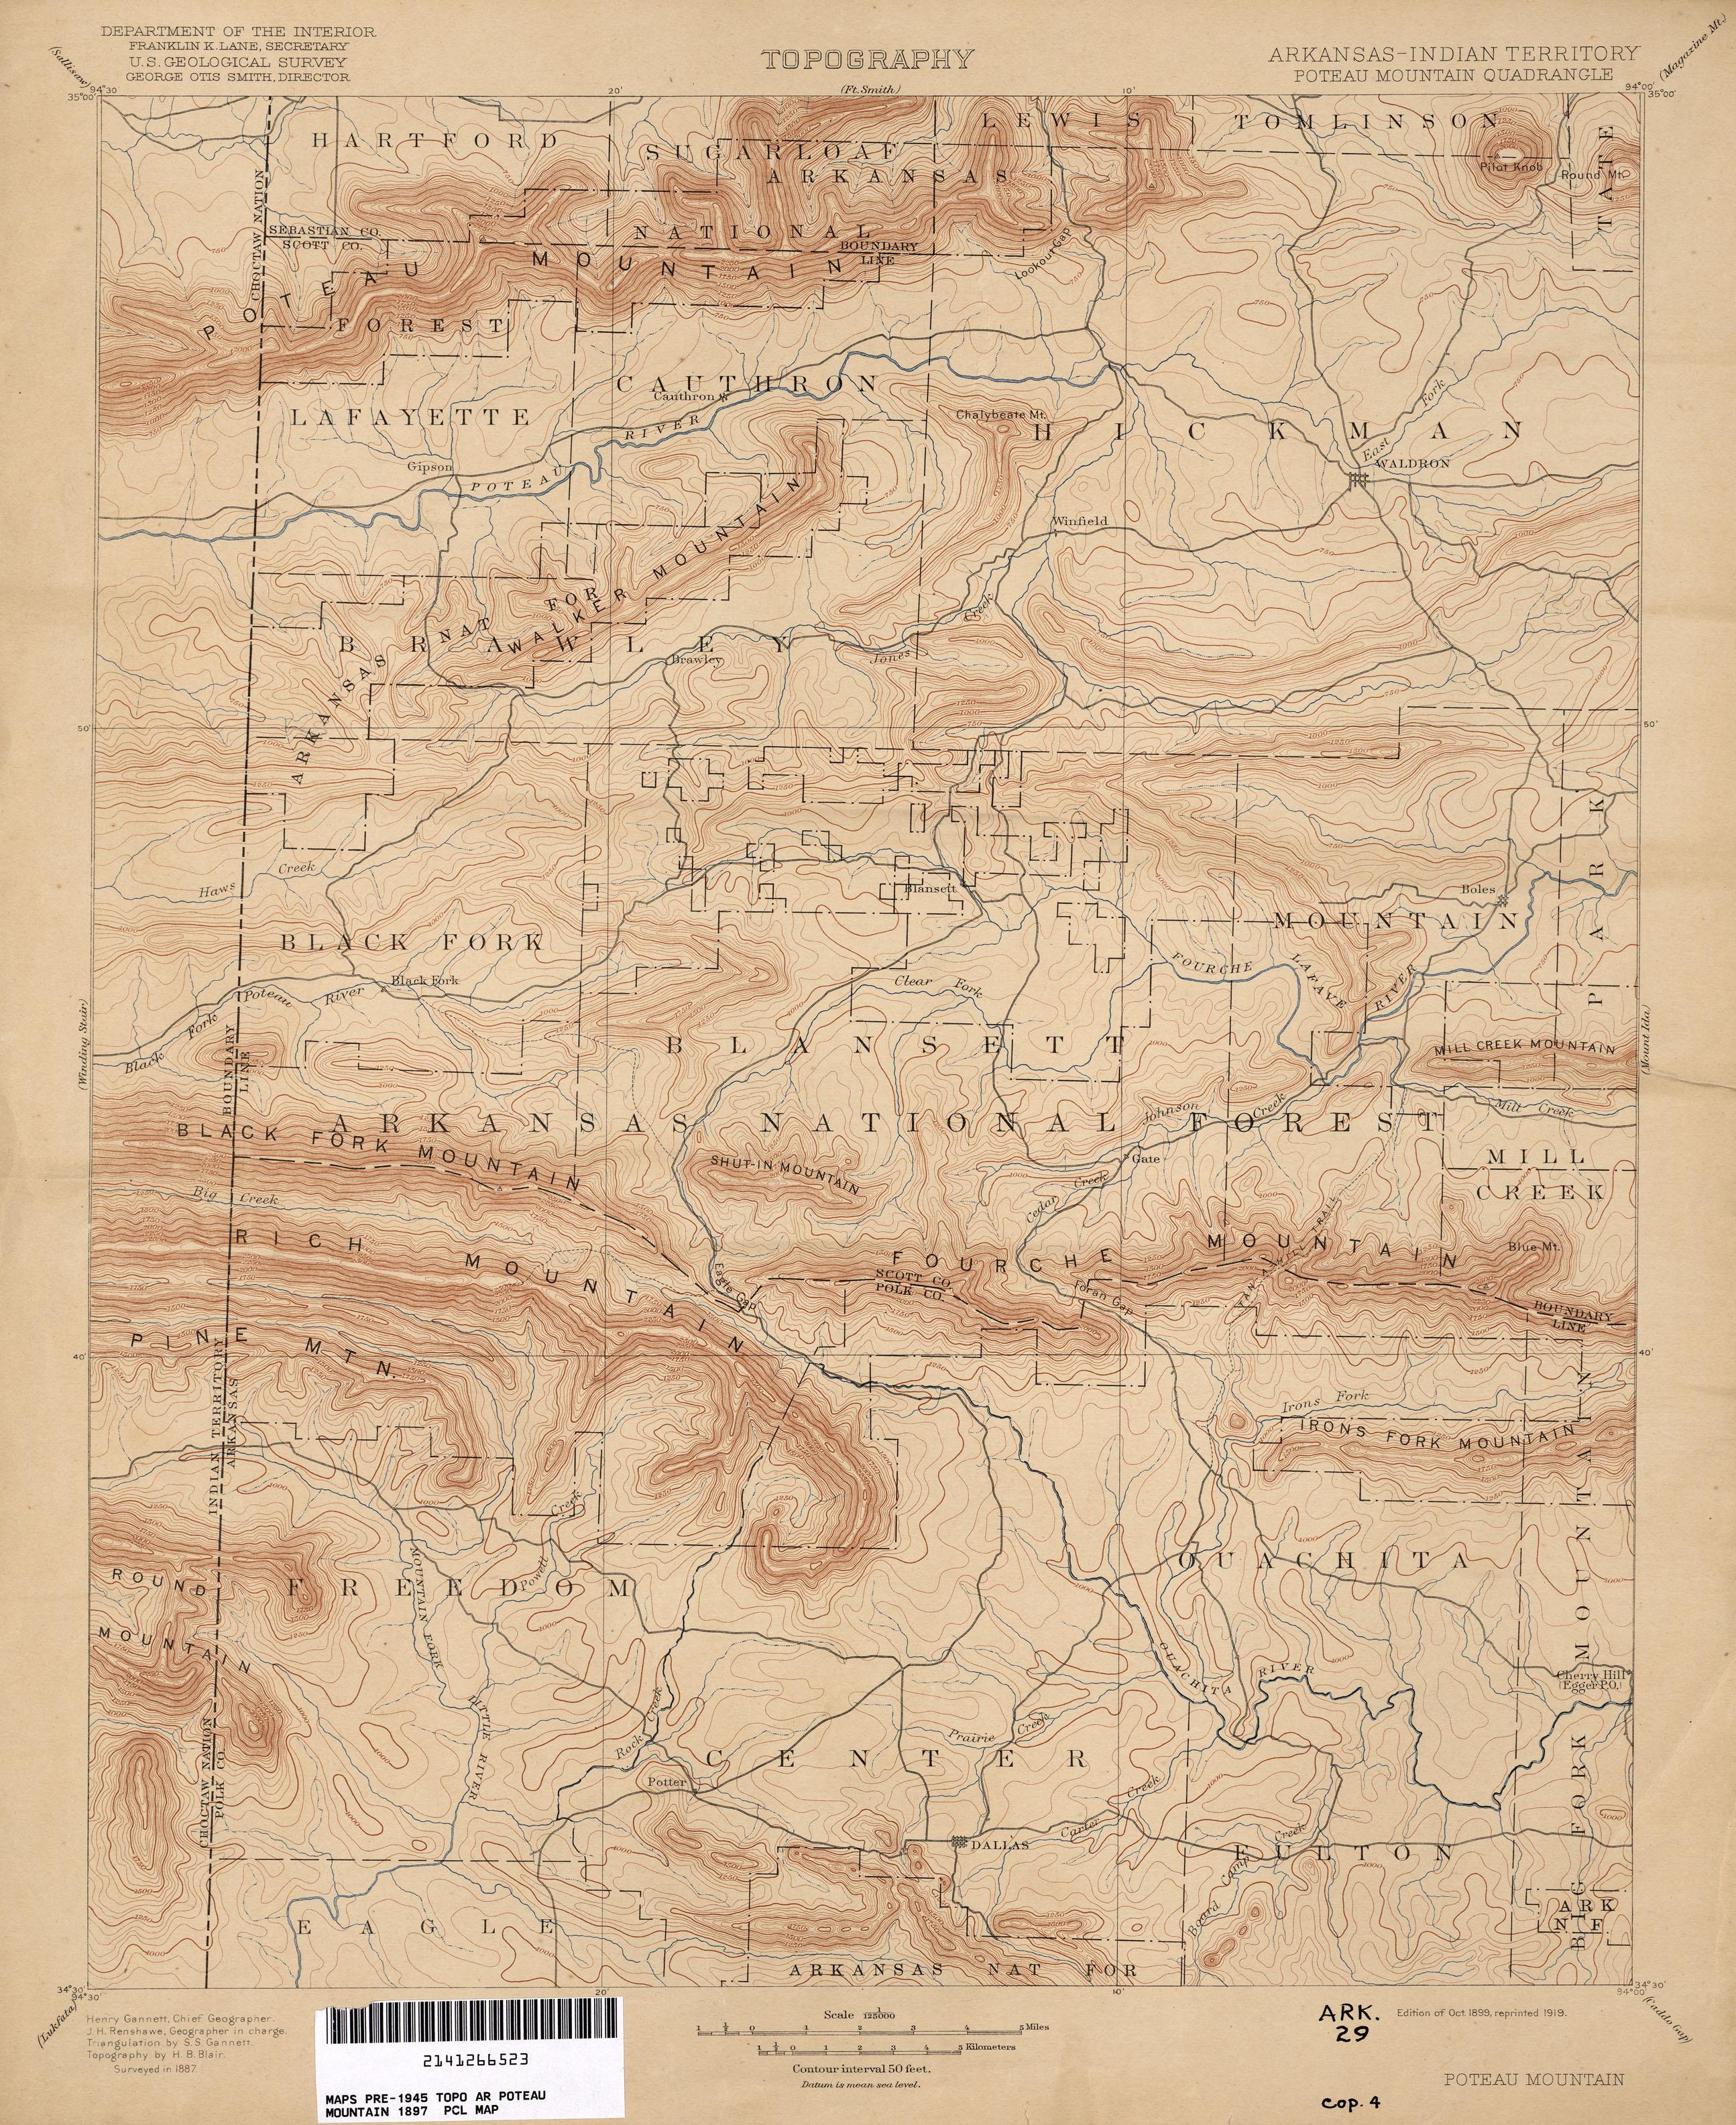 Free Arkansas Topographic Map.Arkansas Historical Topographic Maps Perry Castaneda Map